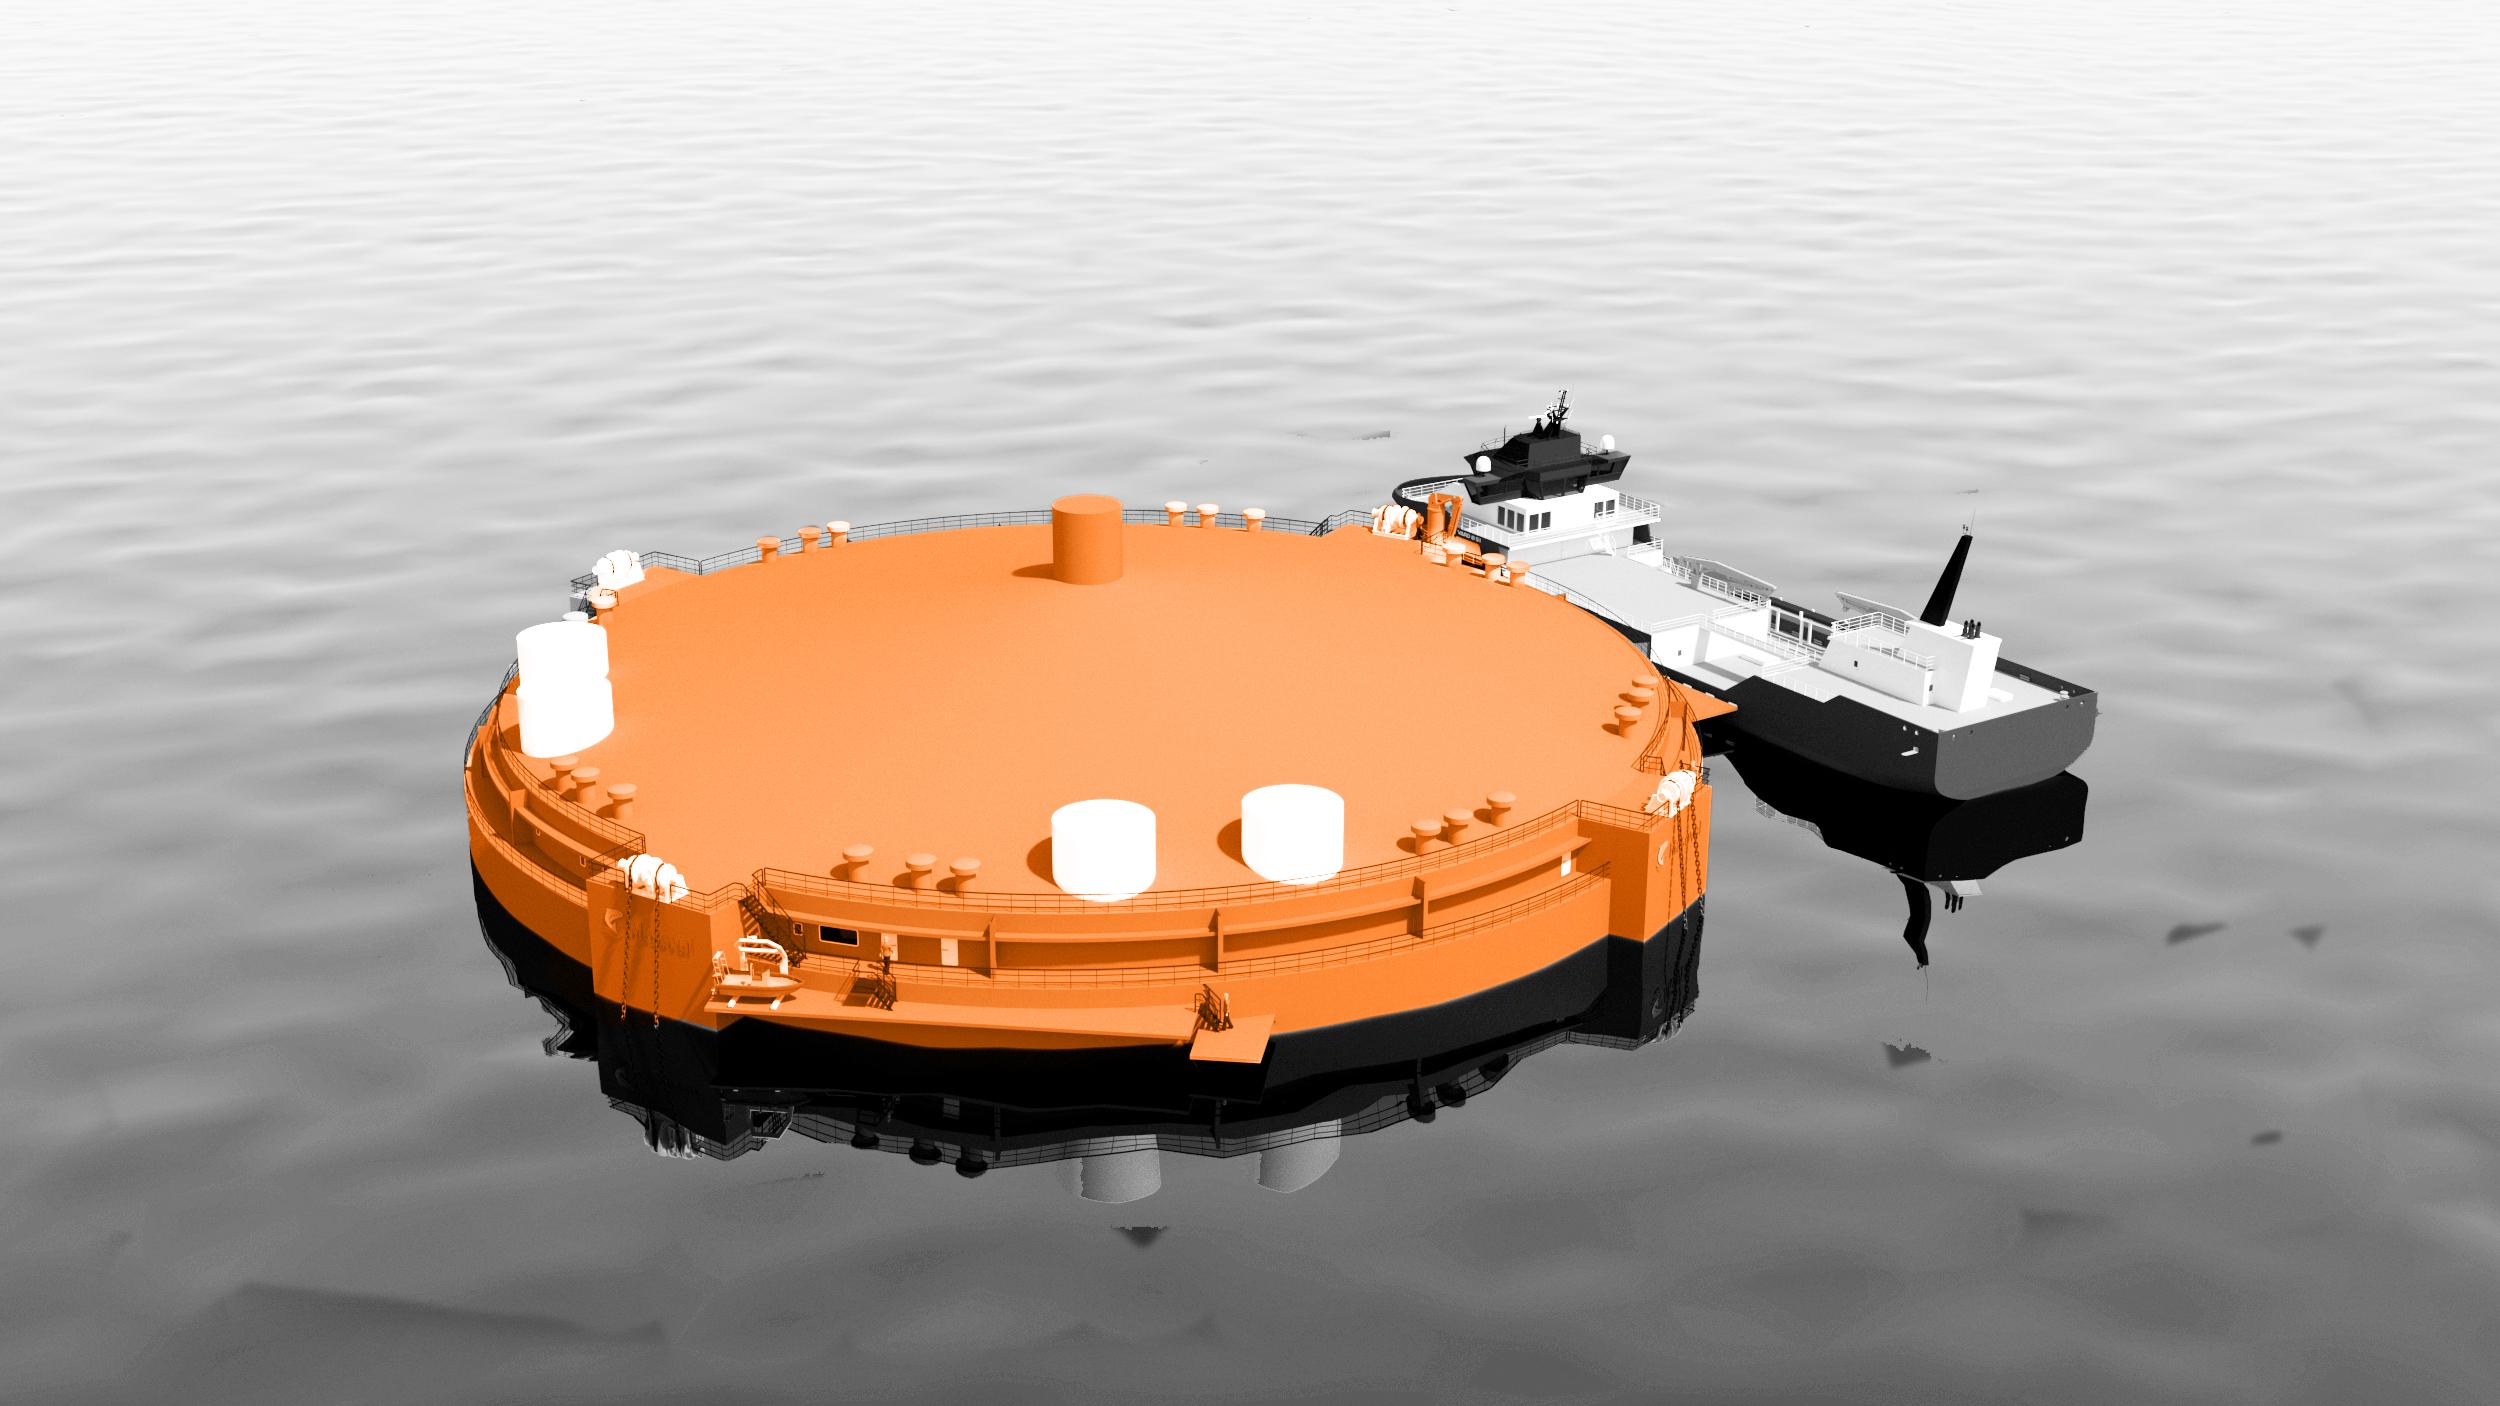 Aqua Semi: Four important development licences